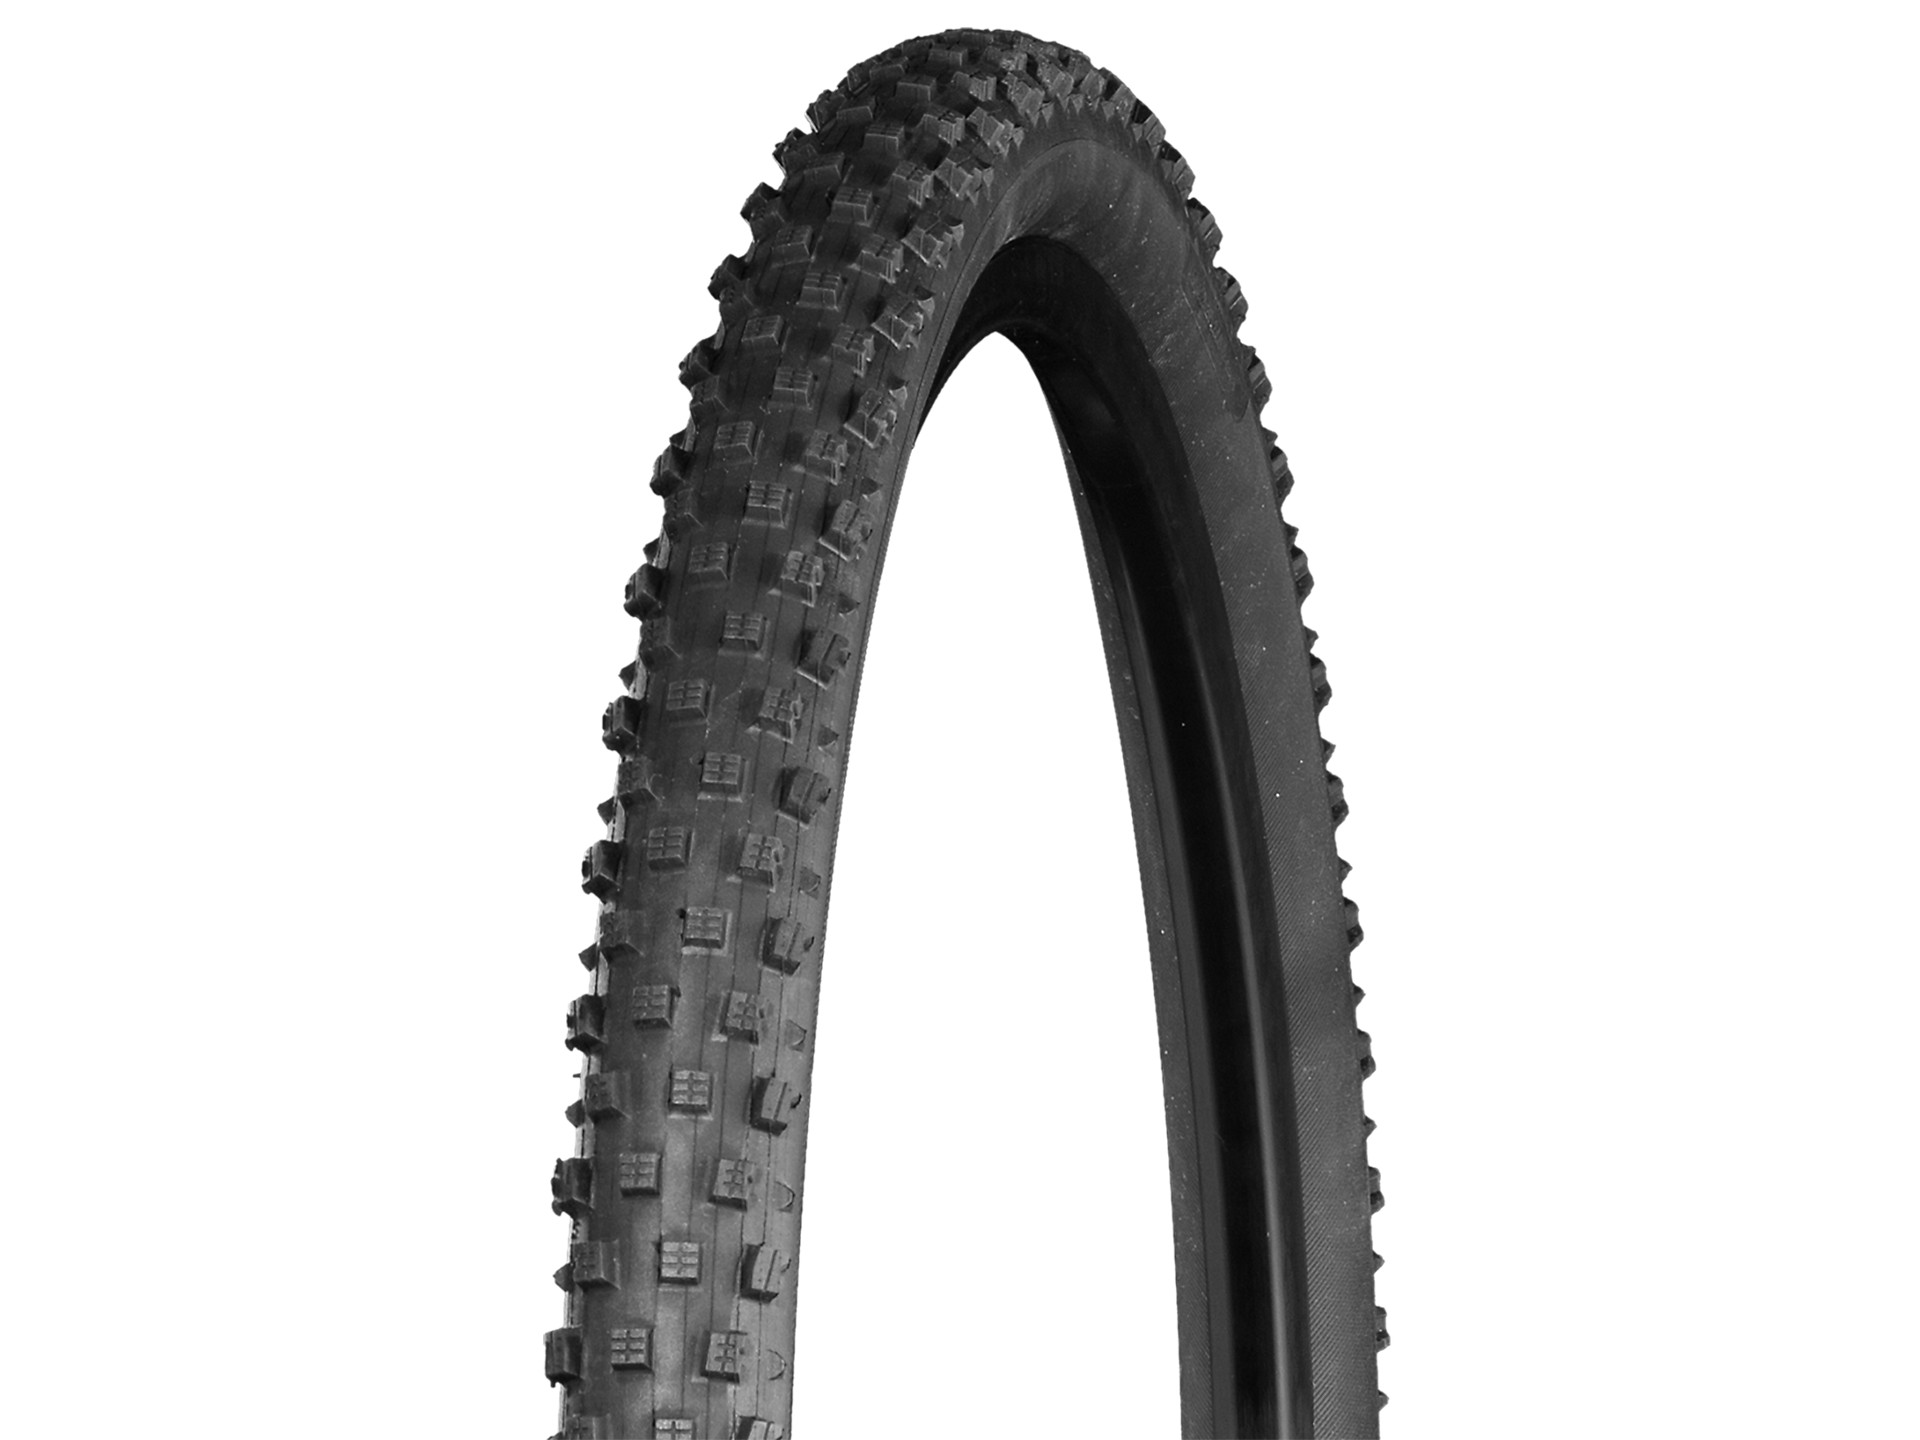 Bontrager XR3 Mud Team Issue TLR mountainbikeband